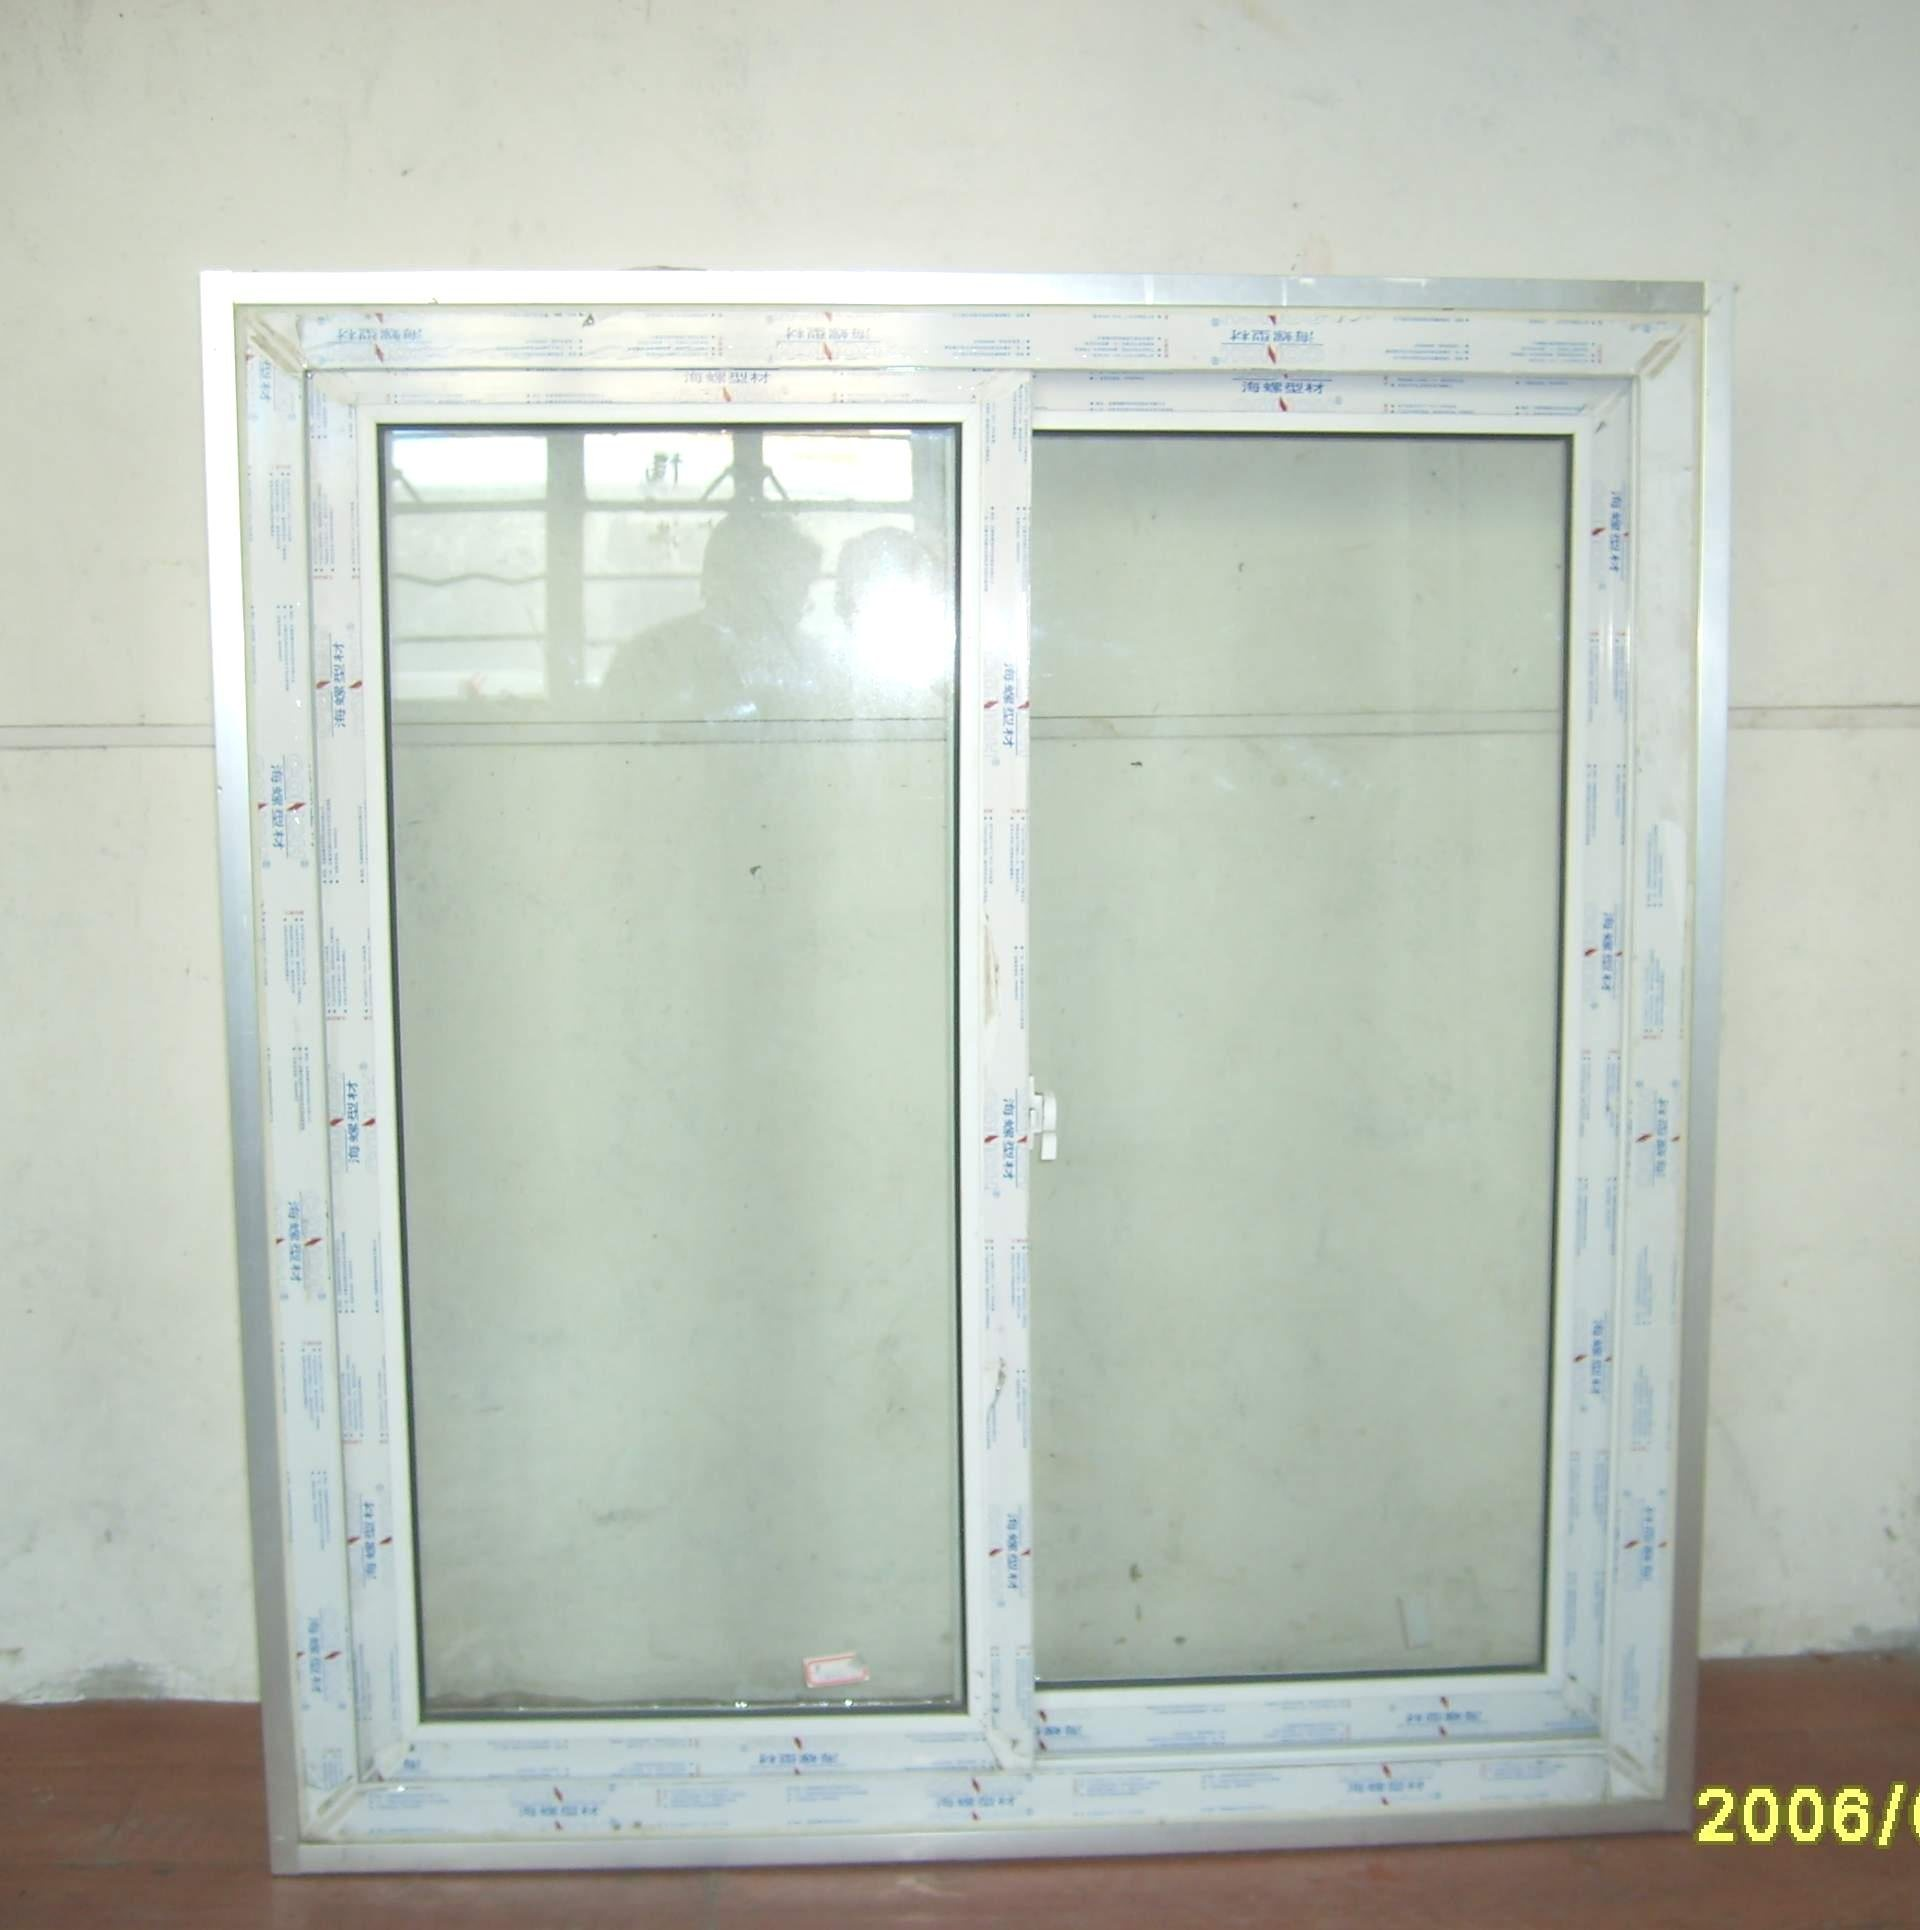 China Pvc Windows : China pvc sliding window w photos pictures